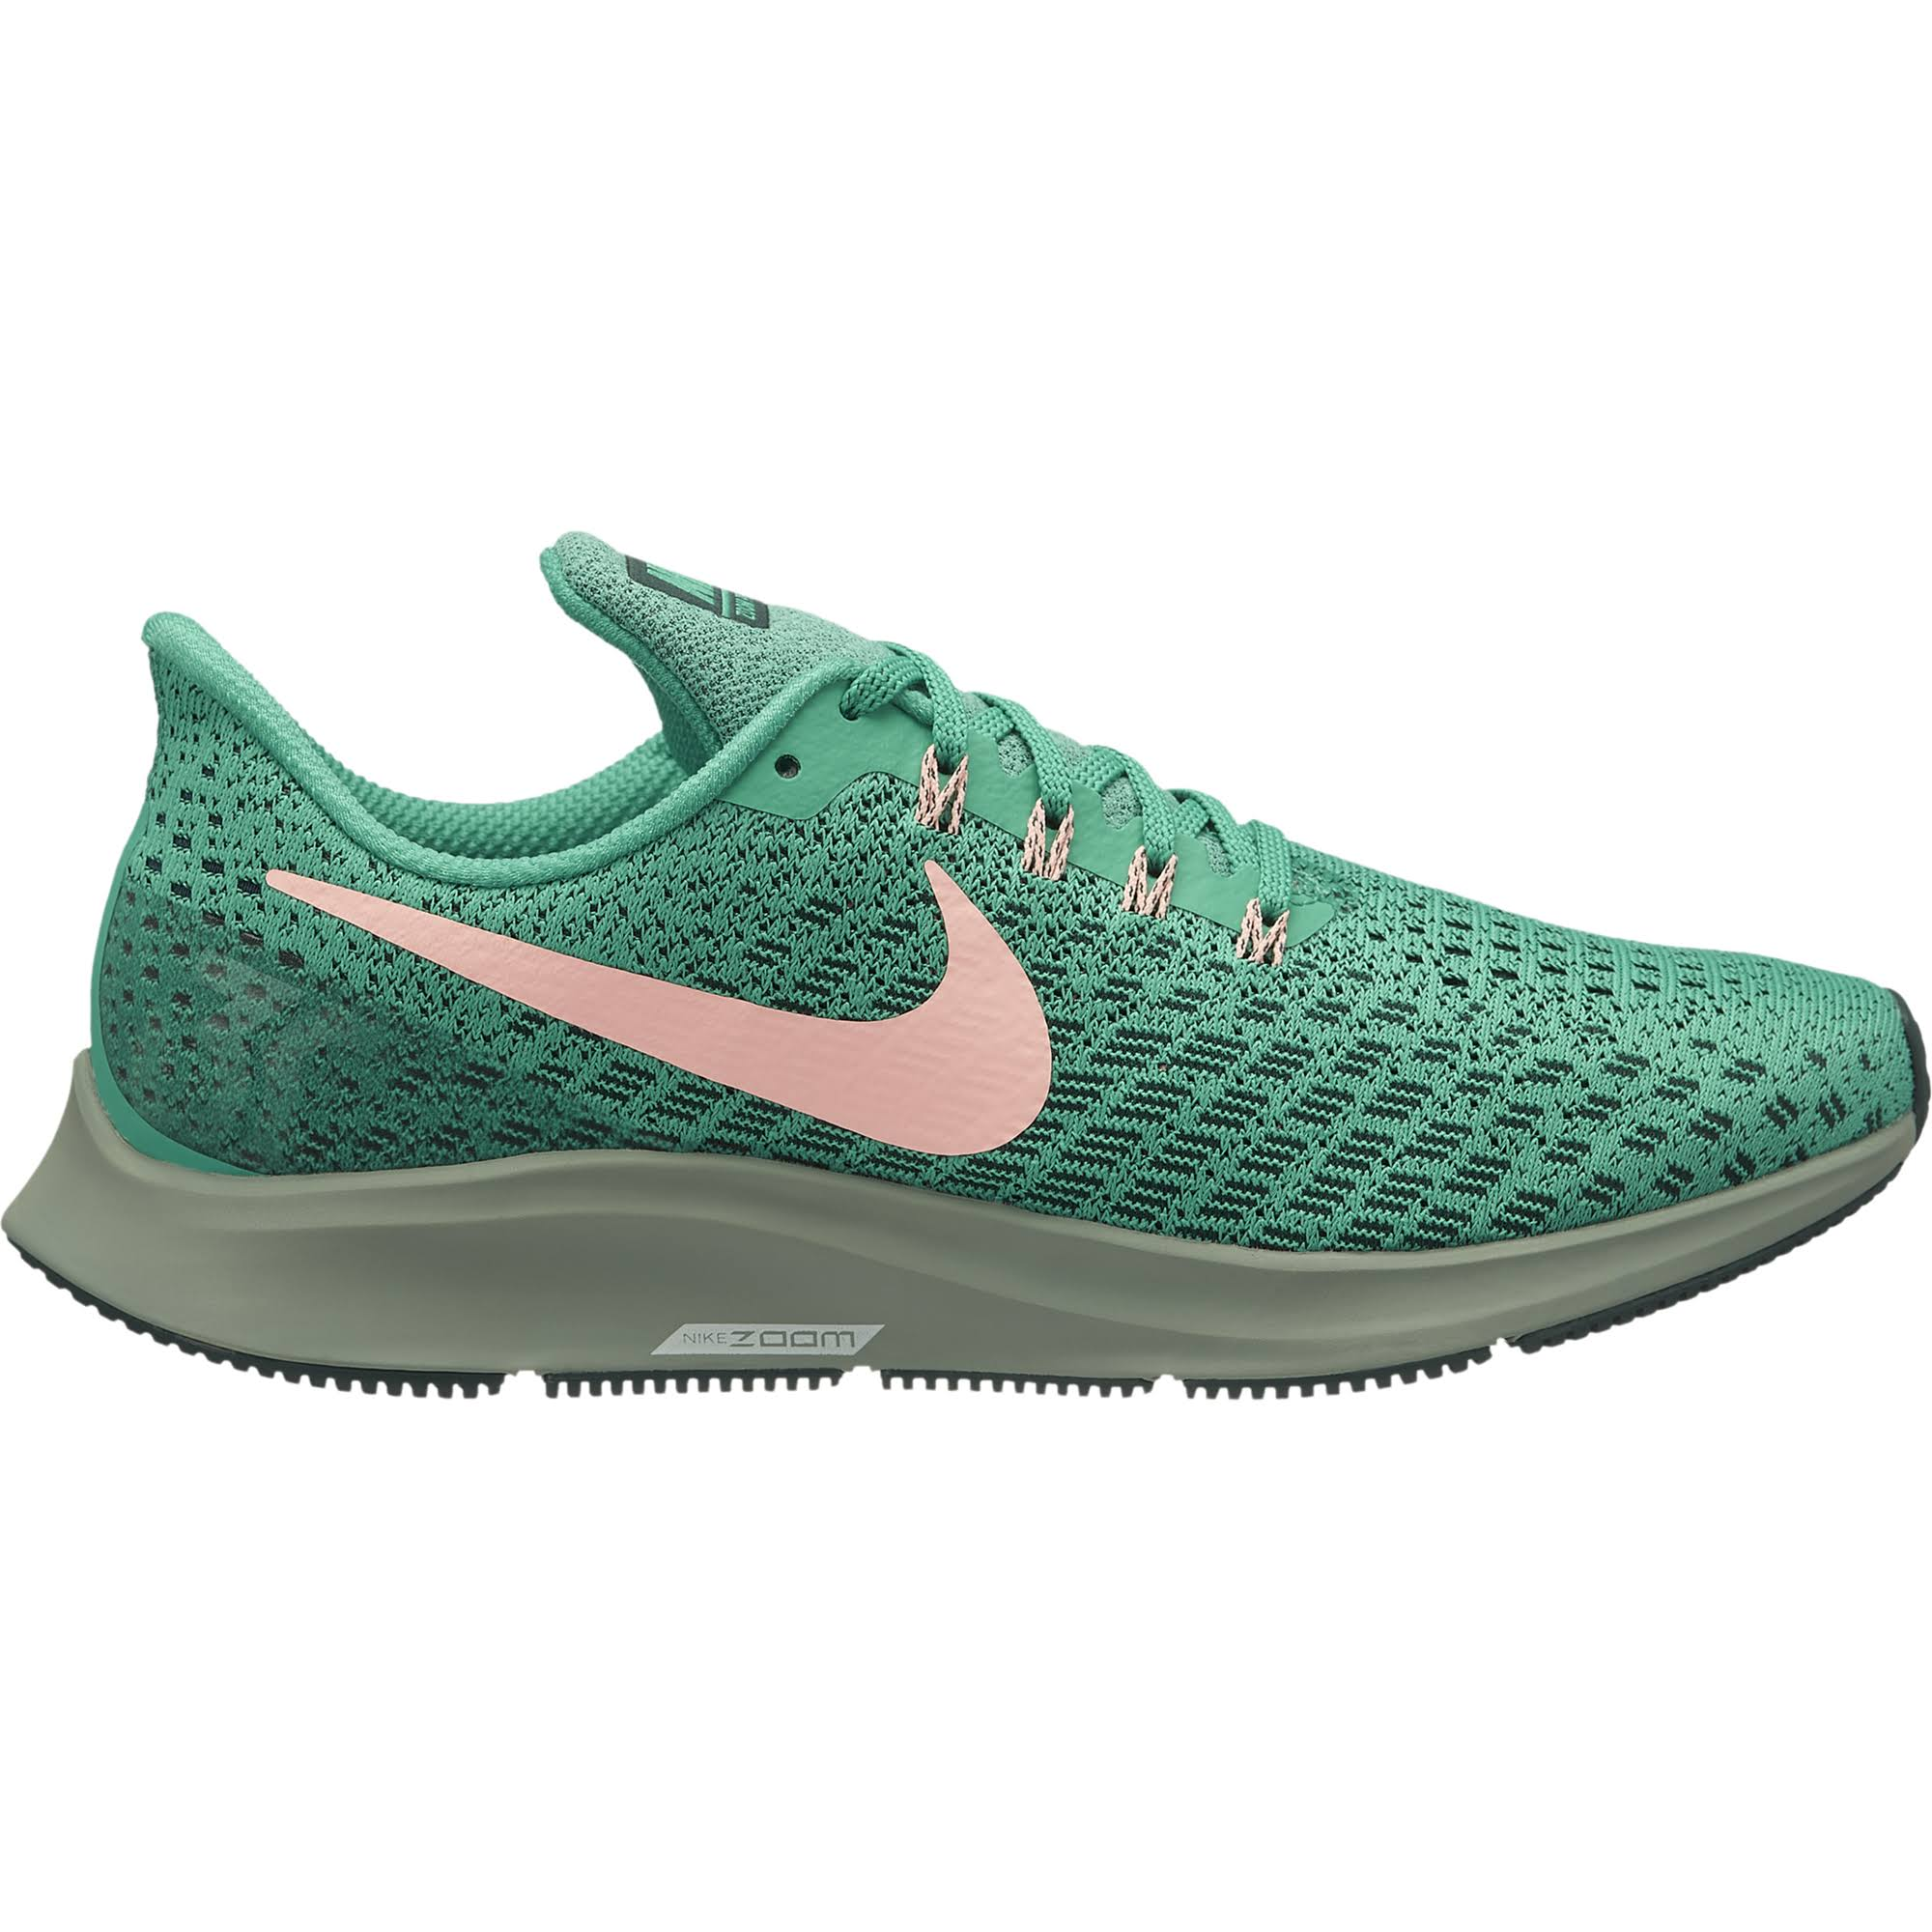 Scarpa Zoom taglia verderosa Air da 8 Nike 5cinetica Pegasus per verdecinetica running donna 35 thQsxrdC